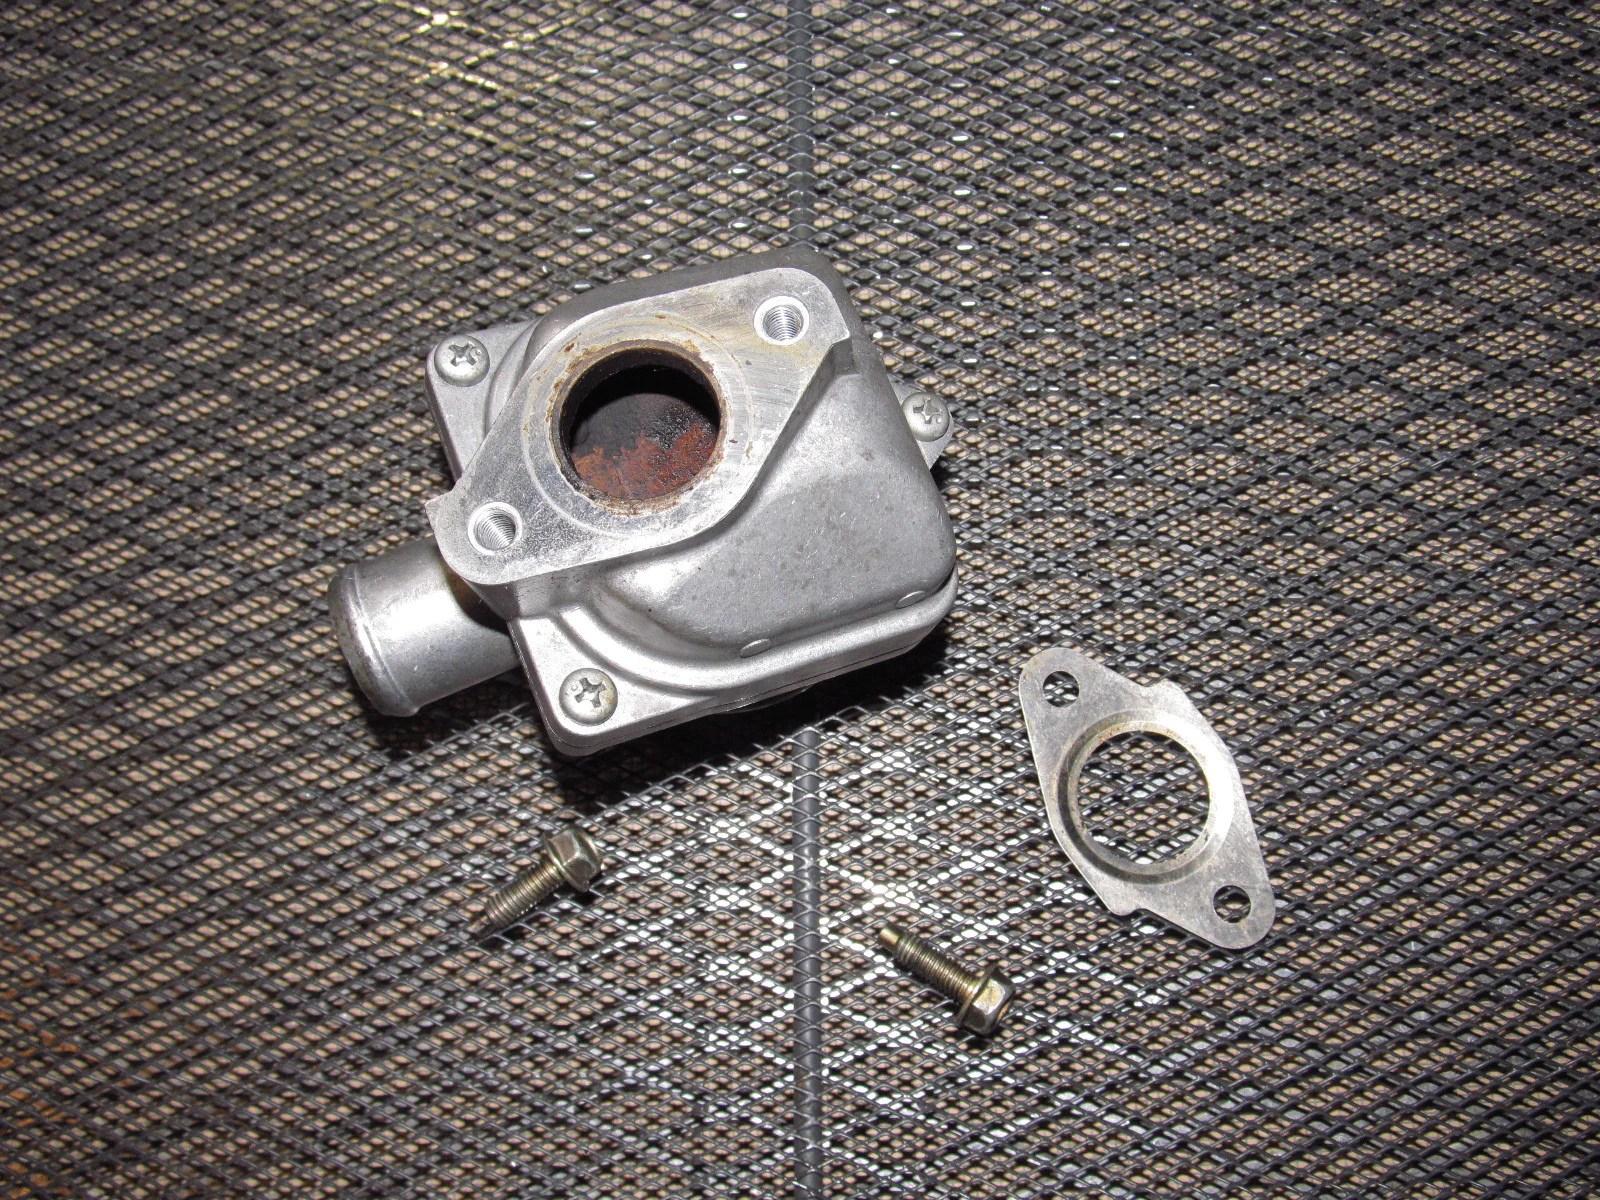 04 05 06 07 08 mazda rx8 oem air pump check valve [ 1600 x 1200 Pixel ]